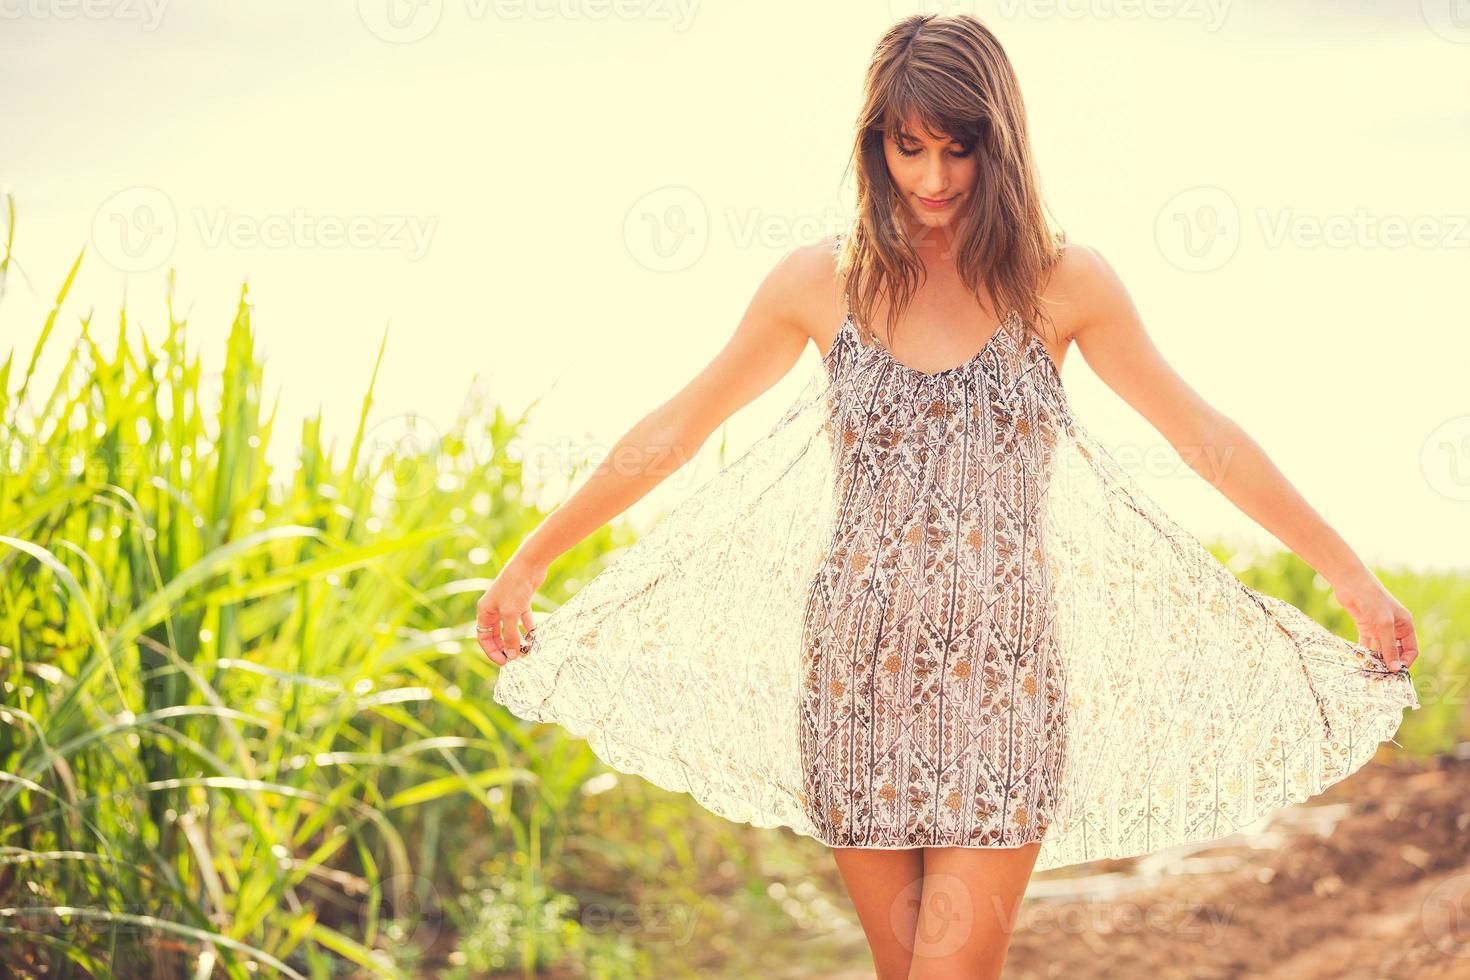 Gorgeous Romantic Girl Outdoors. Summer Lifestyle photo